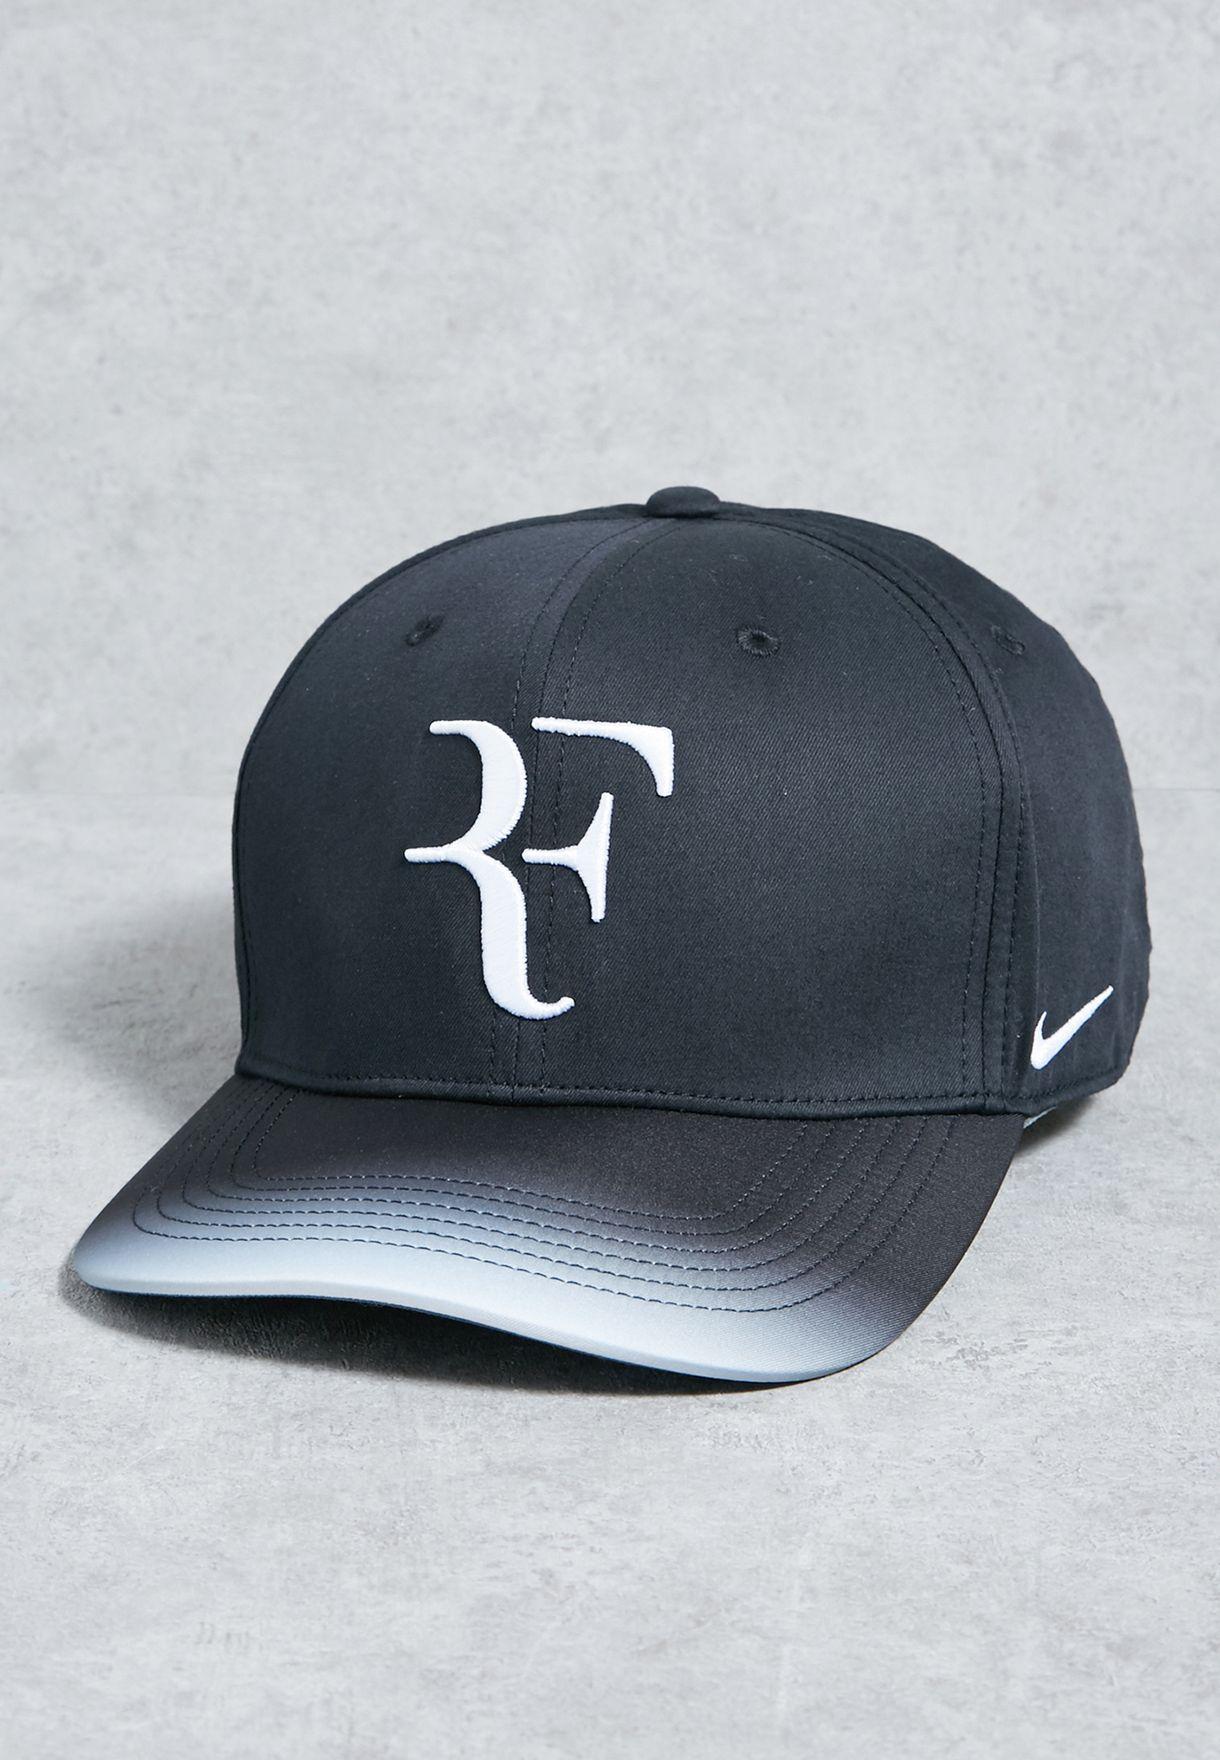 Shop Nike Black Aerobill Roger Federer Cap 868579 013 For